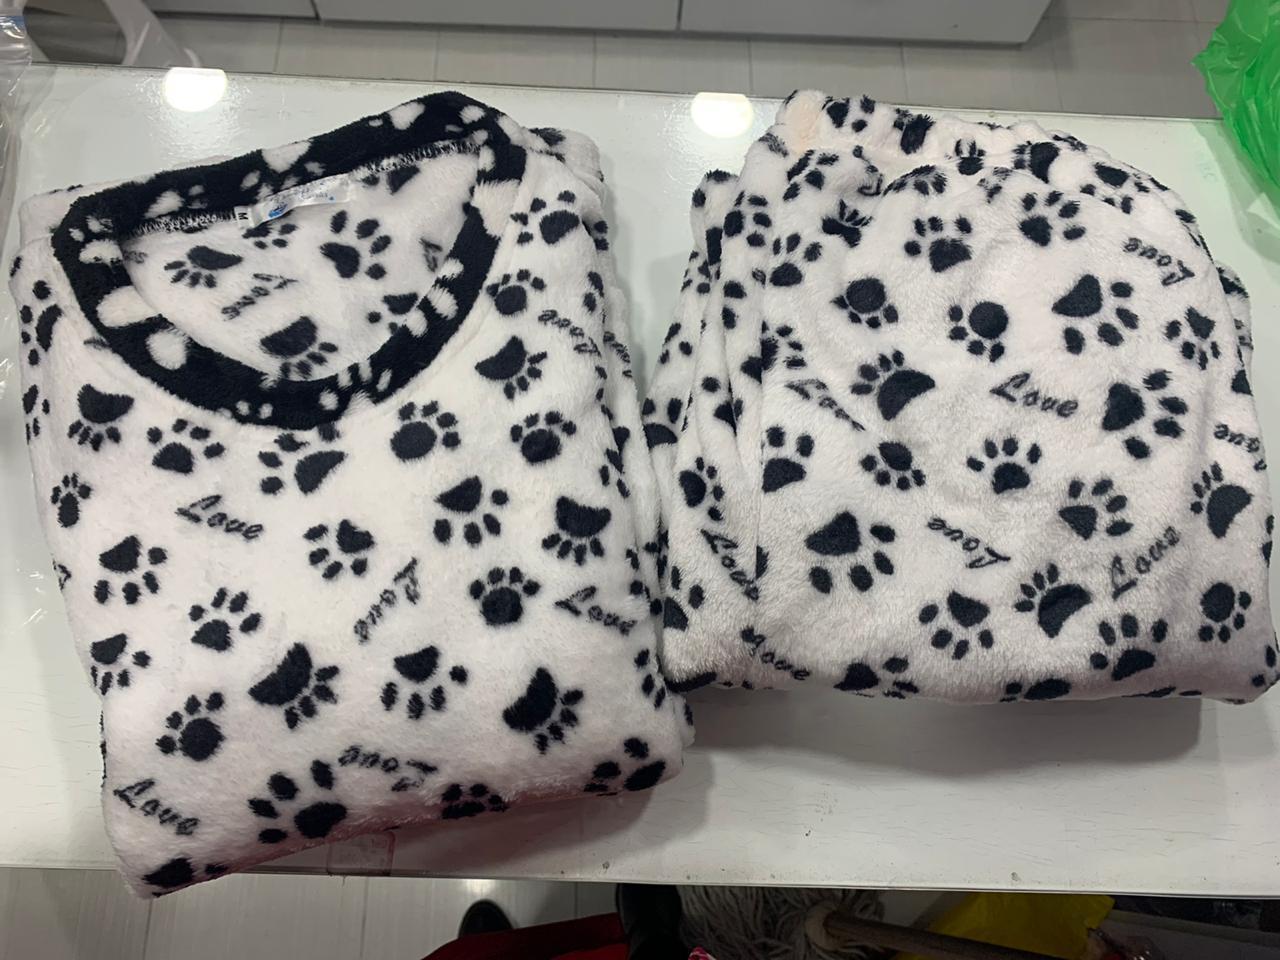 Pijama para dama con huellas de mascota